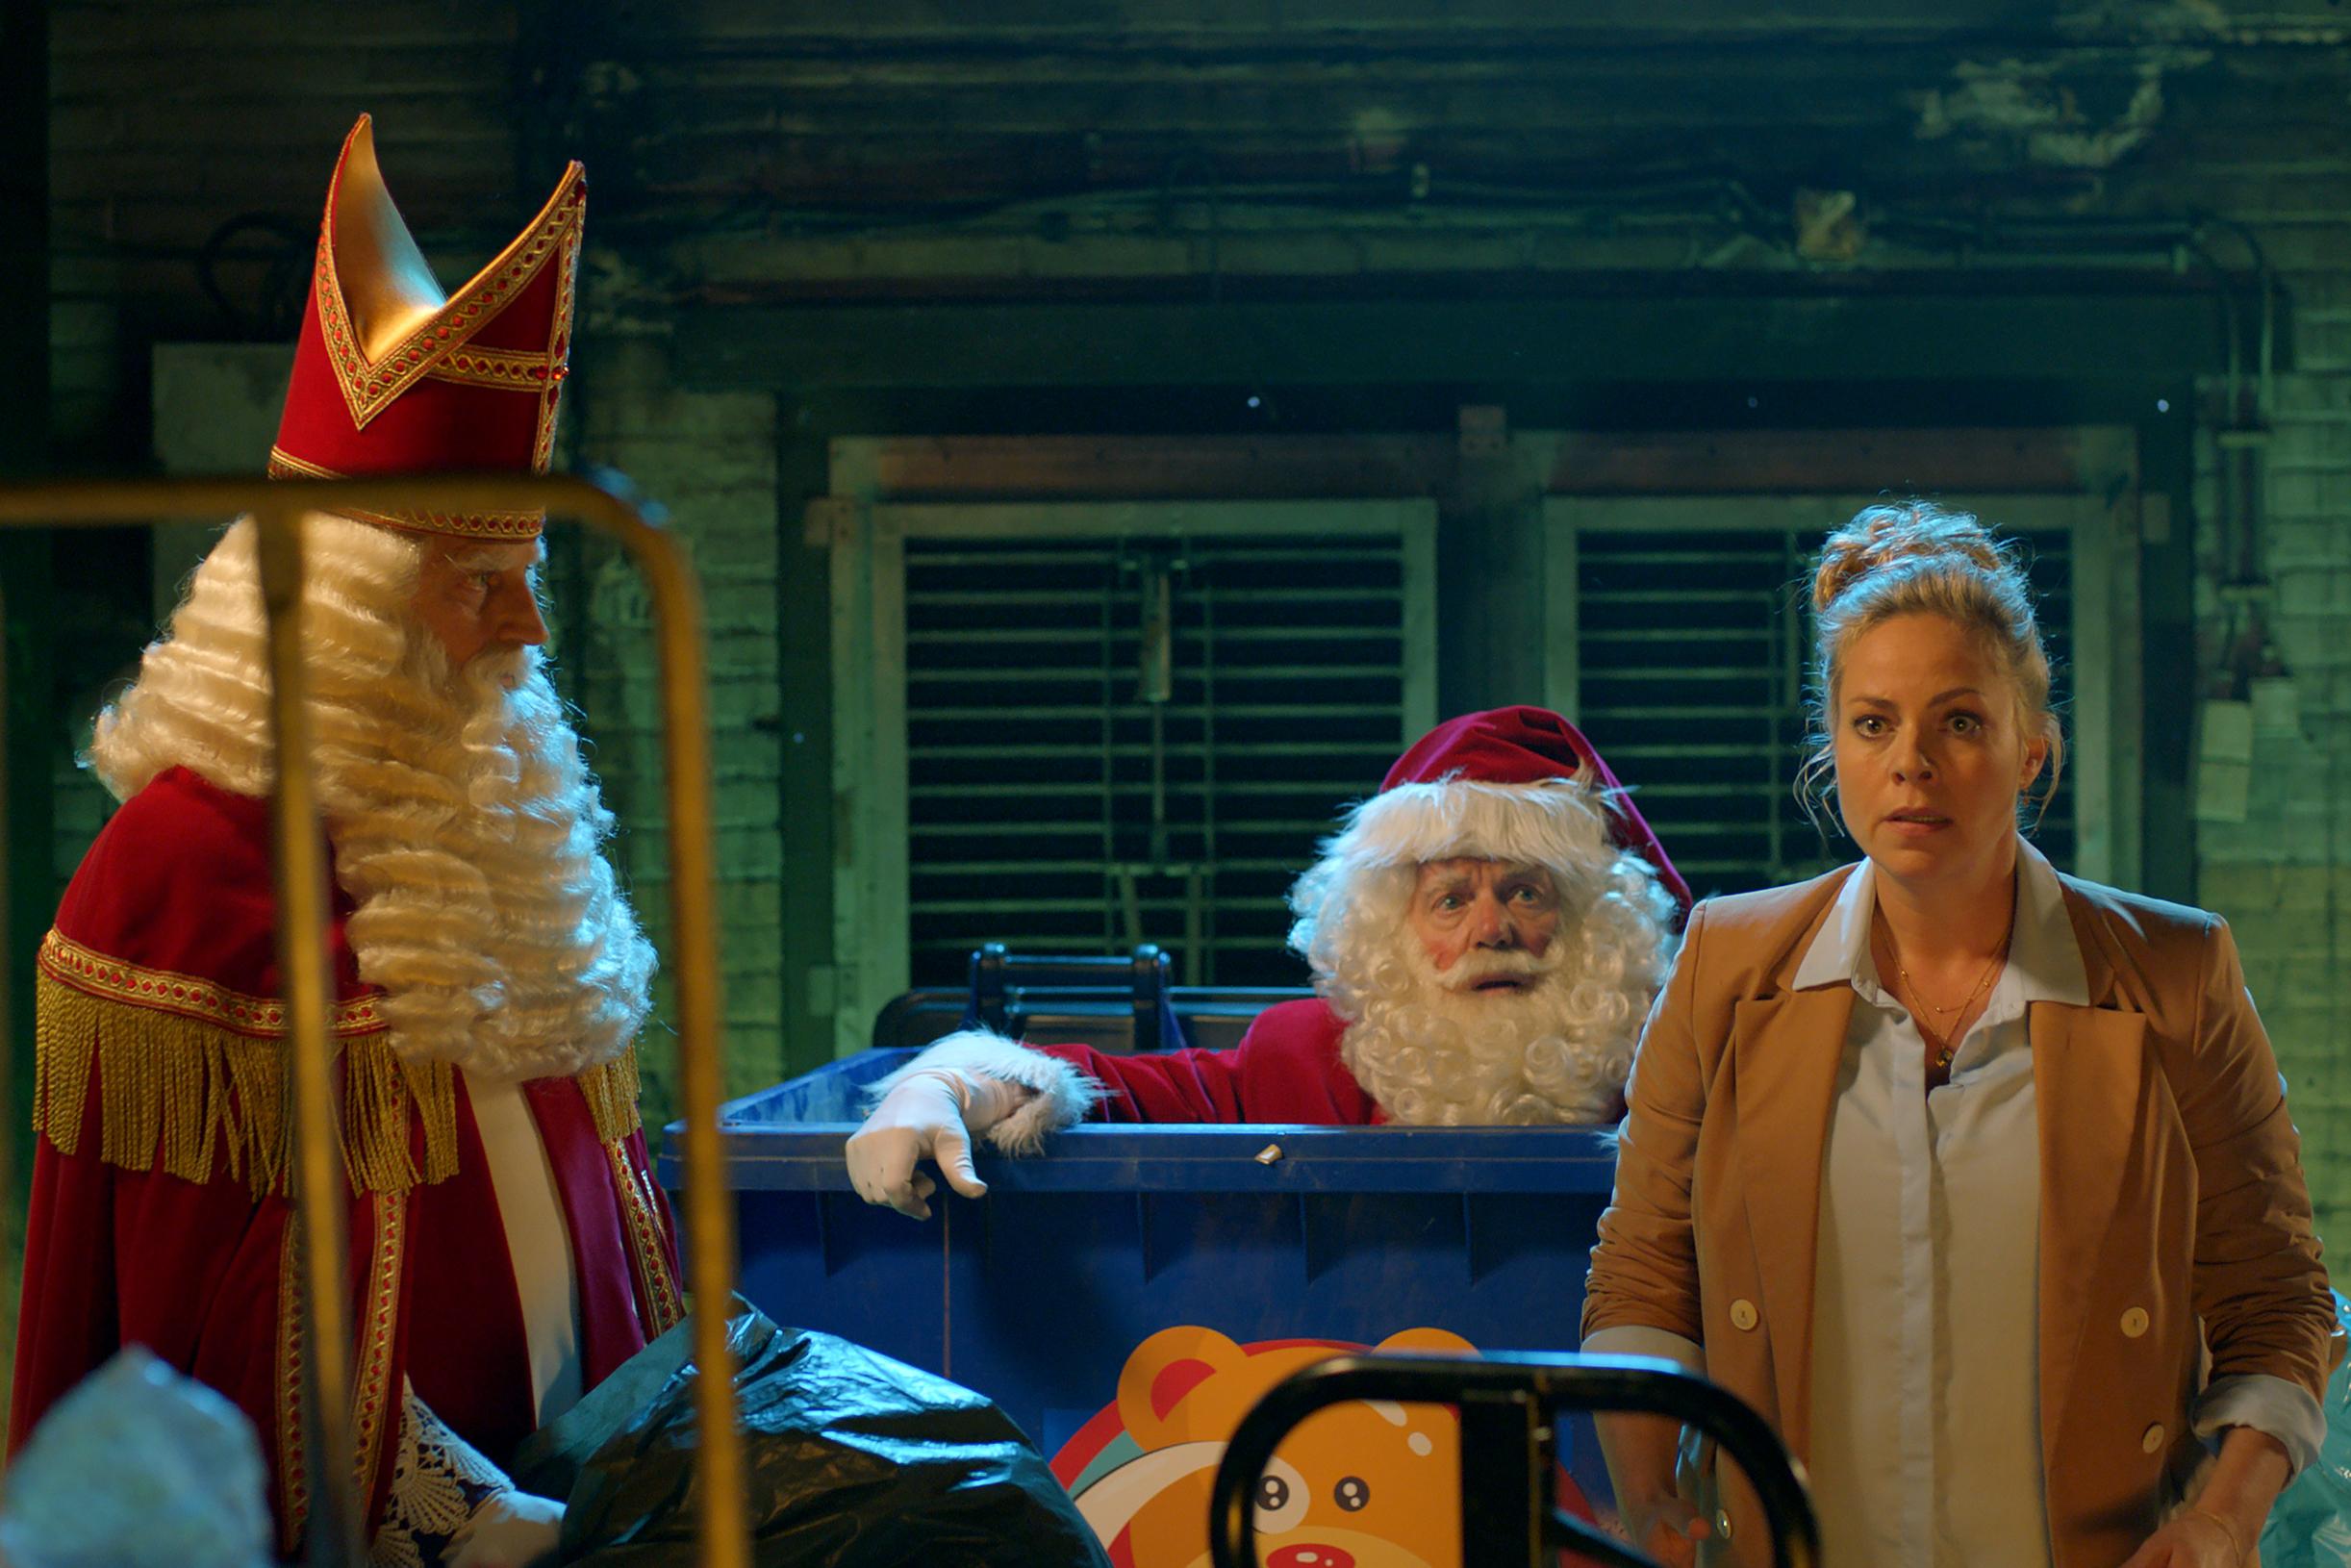 Waar Is Het Grote Boek Van Sinterklaas Bekroond Met Gouden Film Nederlands Film Festival 2020